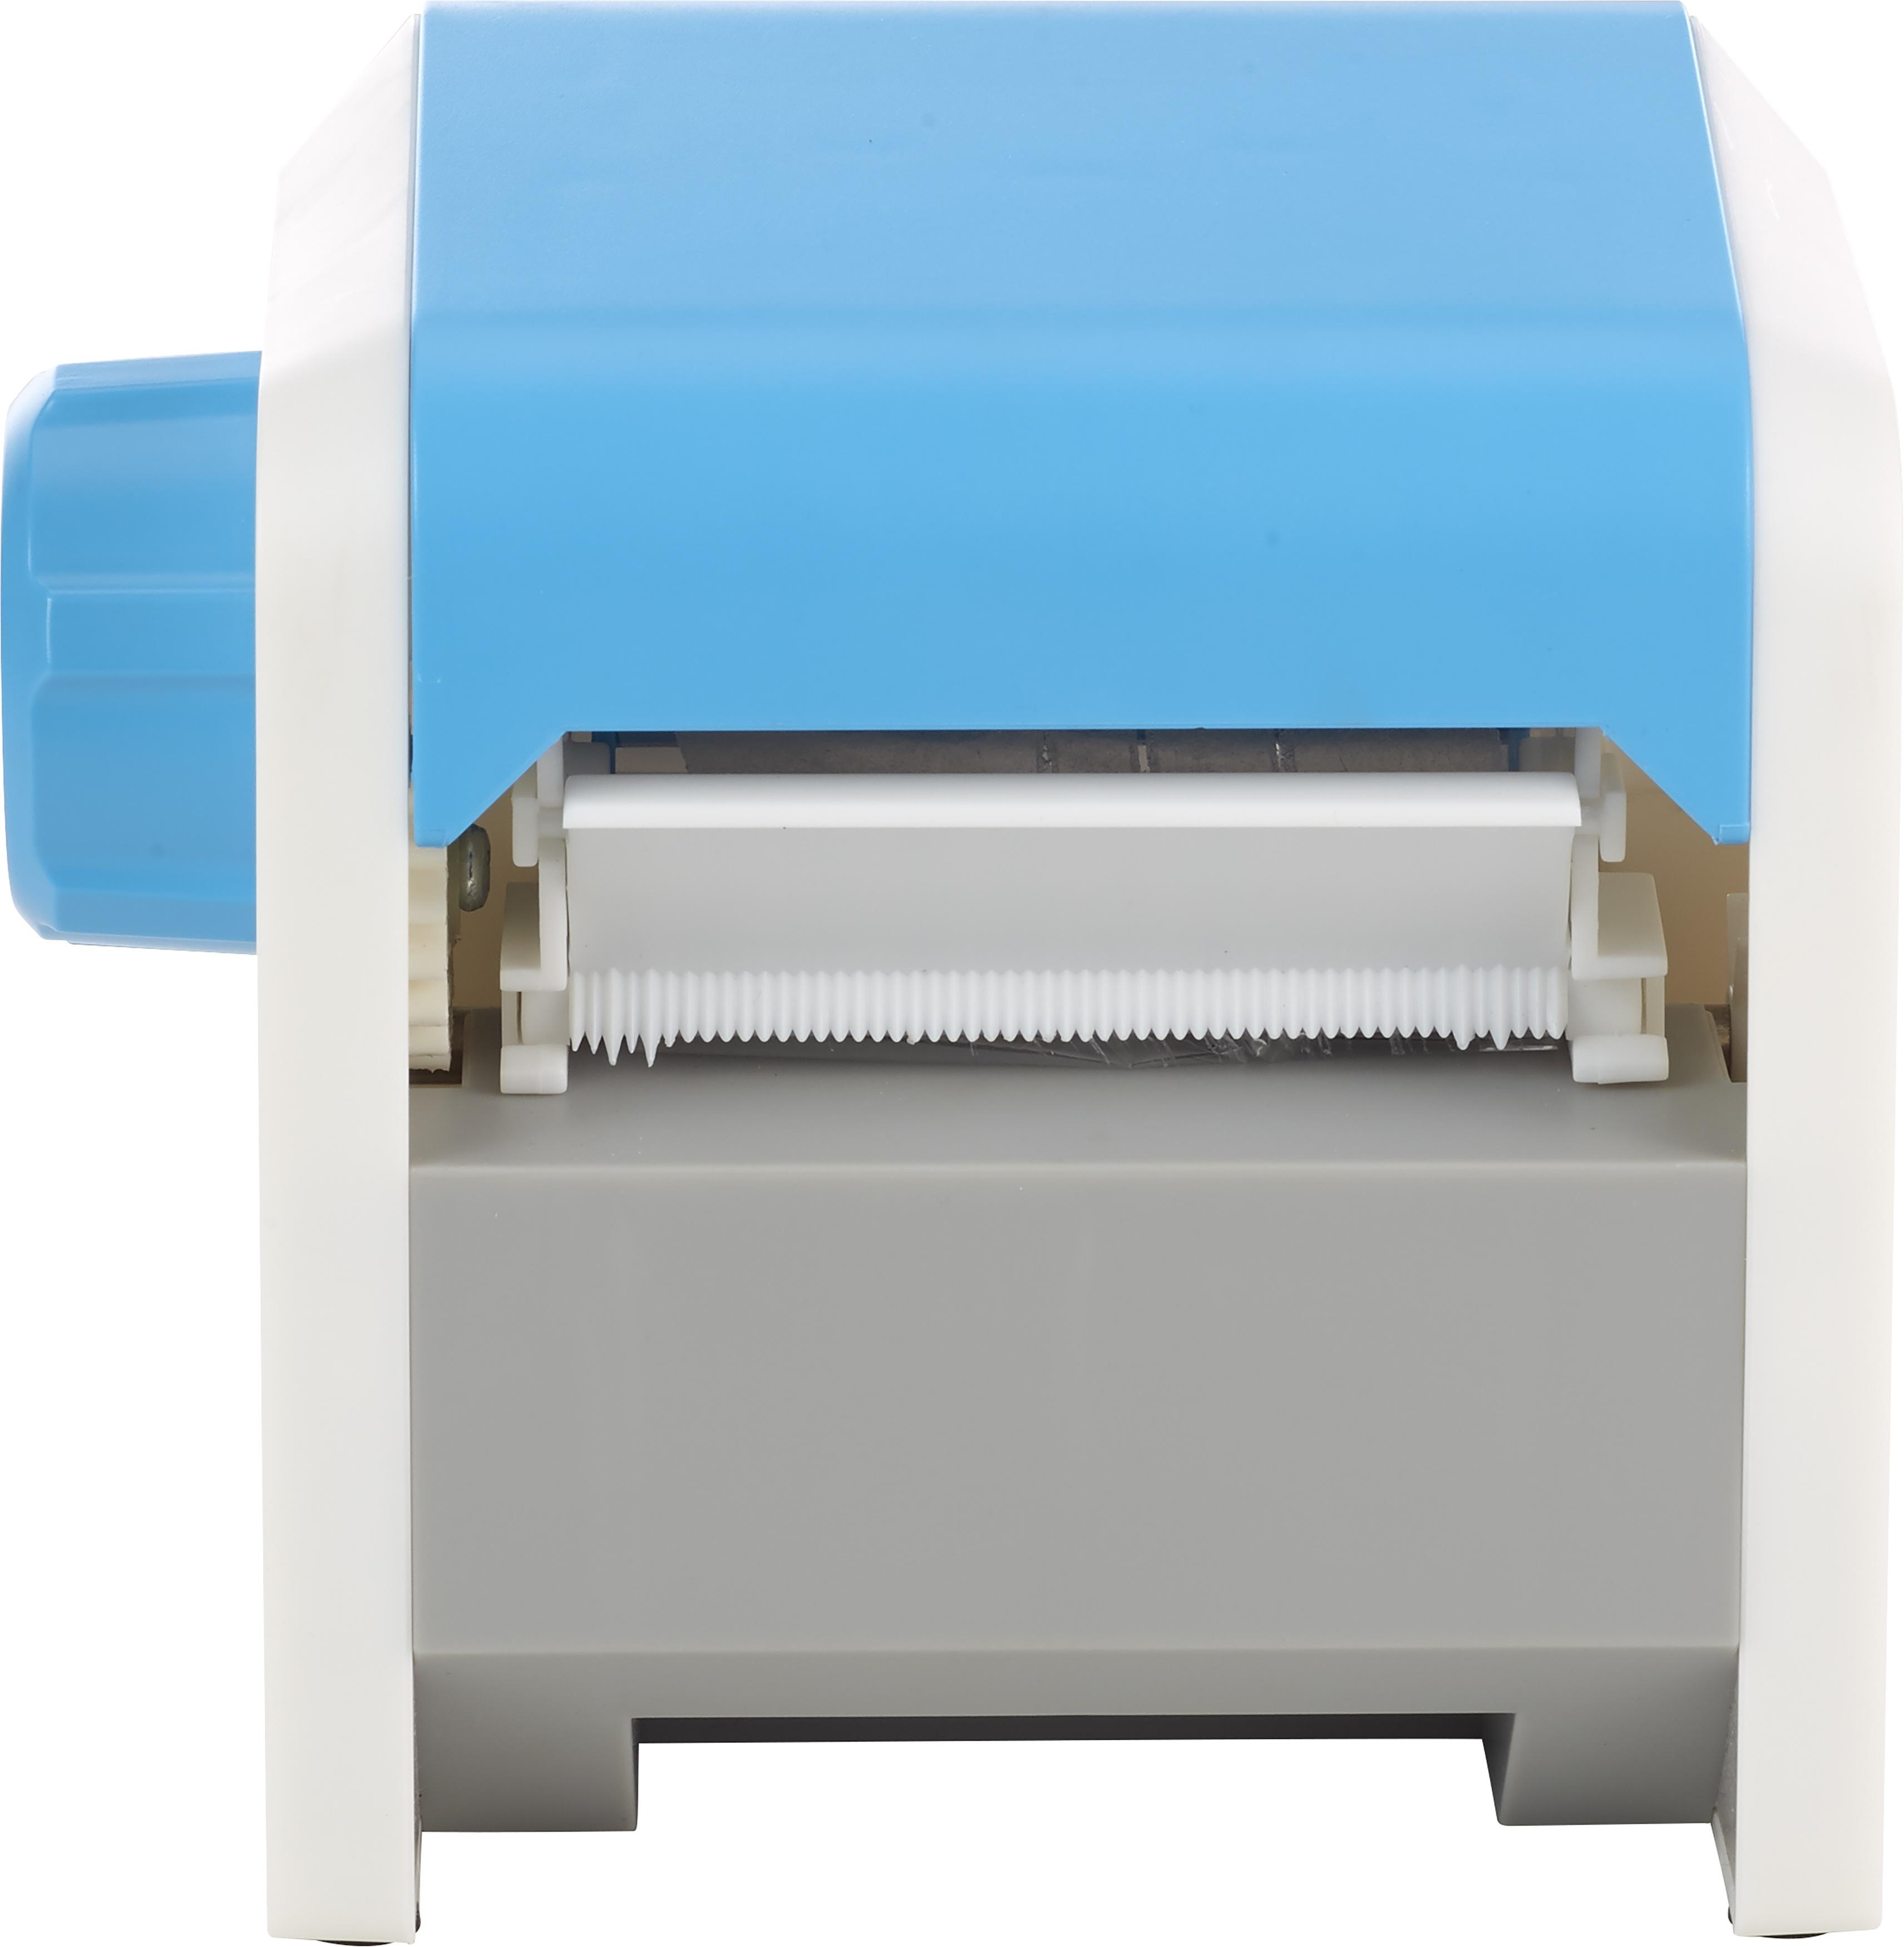 Xyron Create-A-Sticker MINI Machine-2.5X20' Permanent